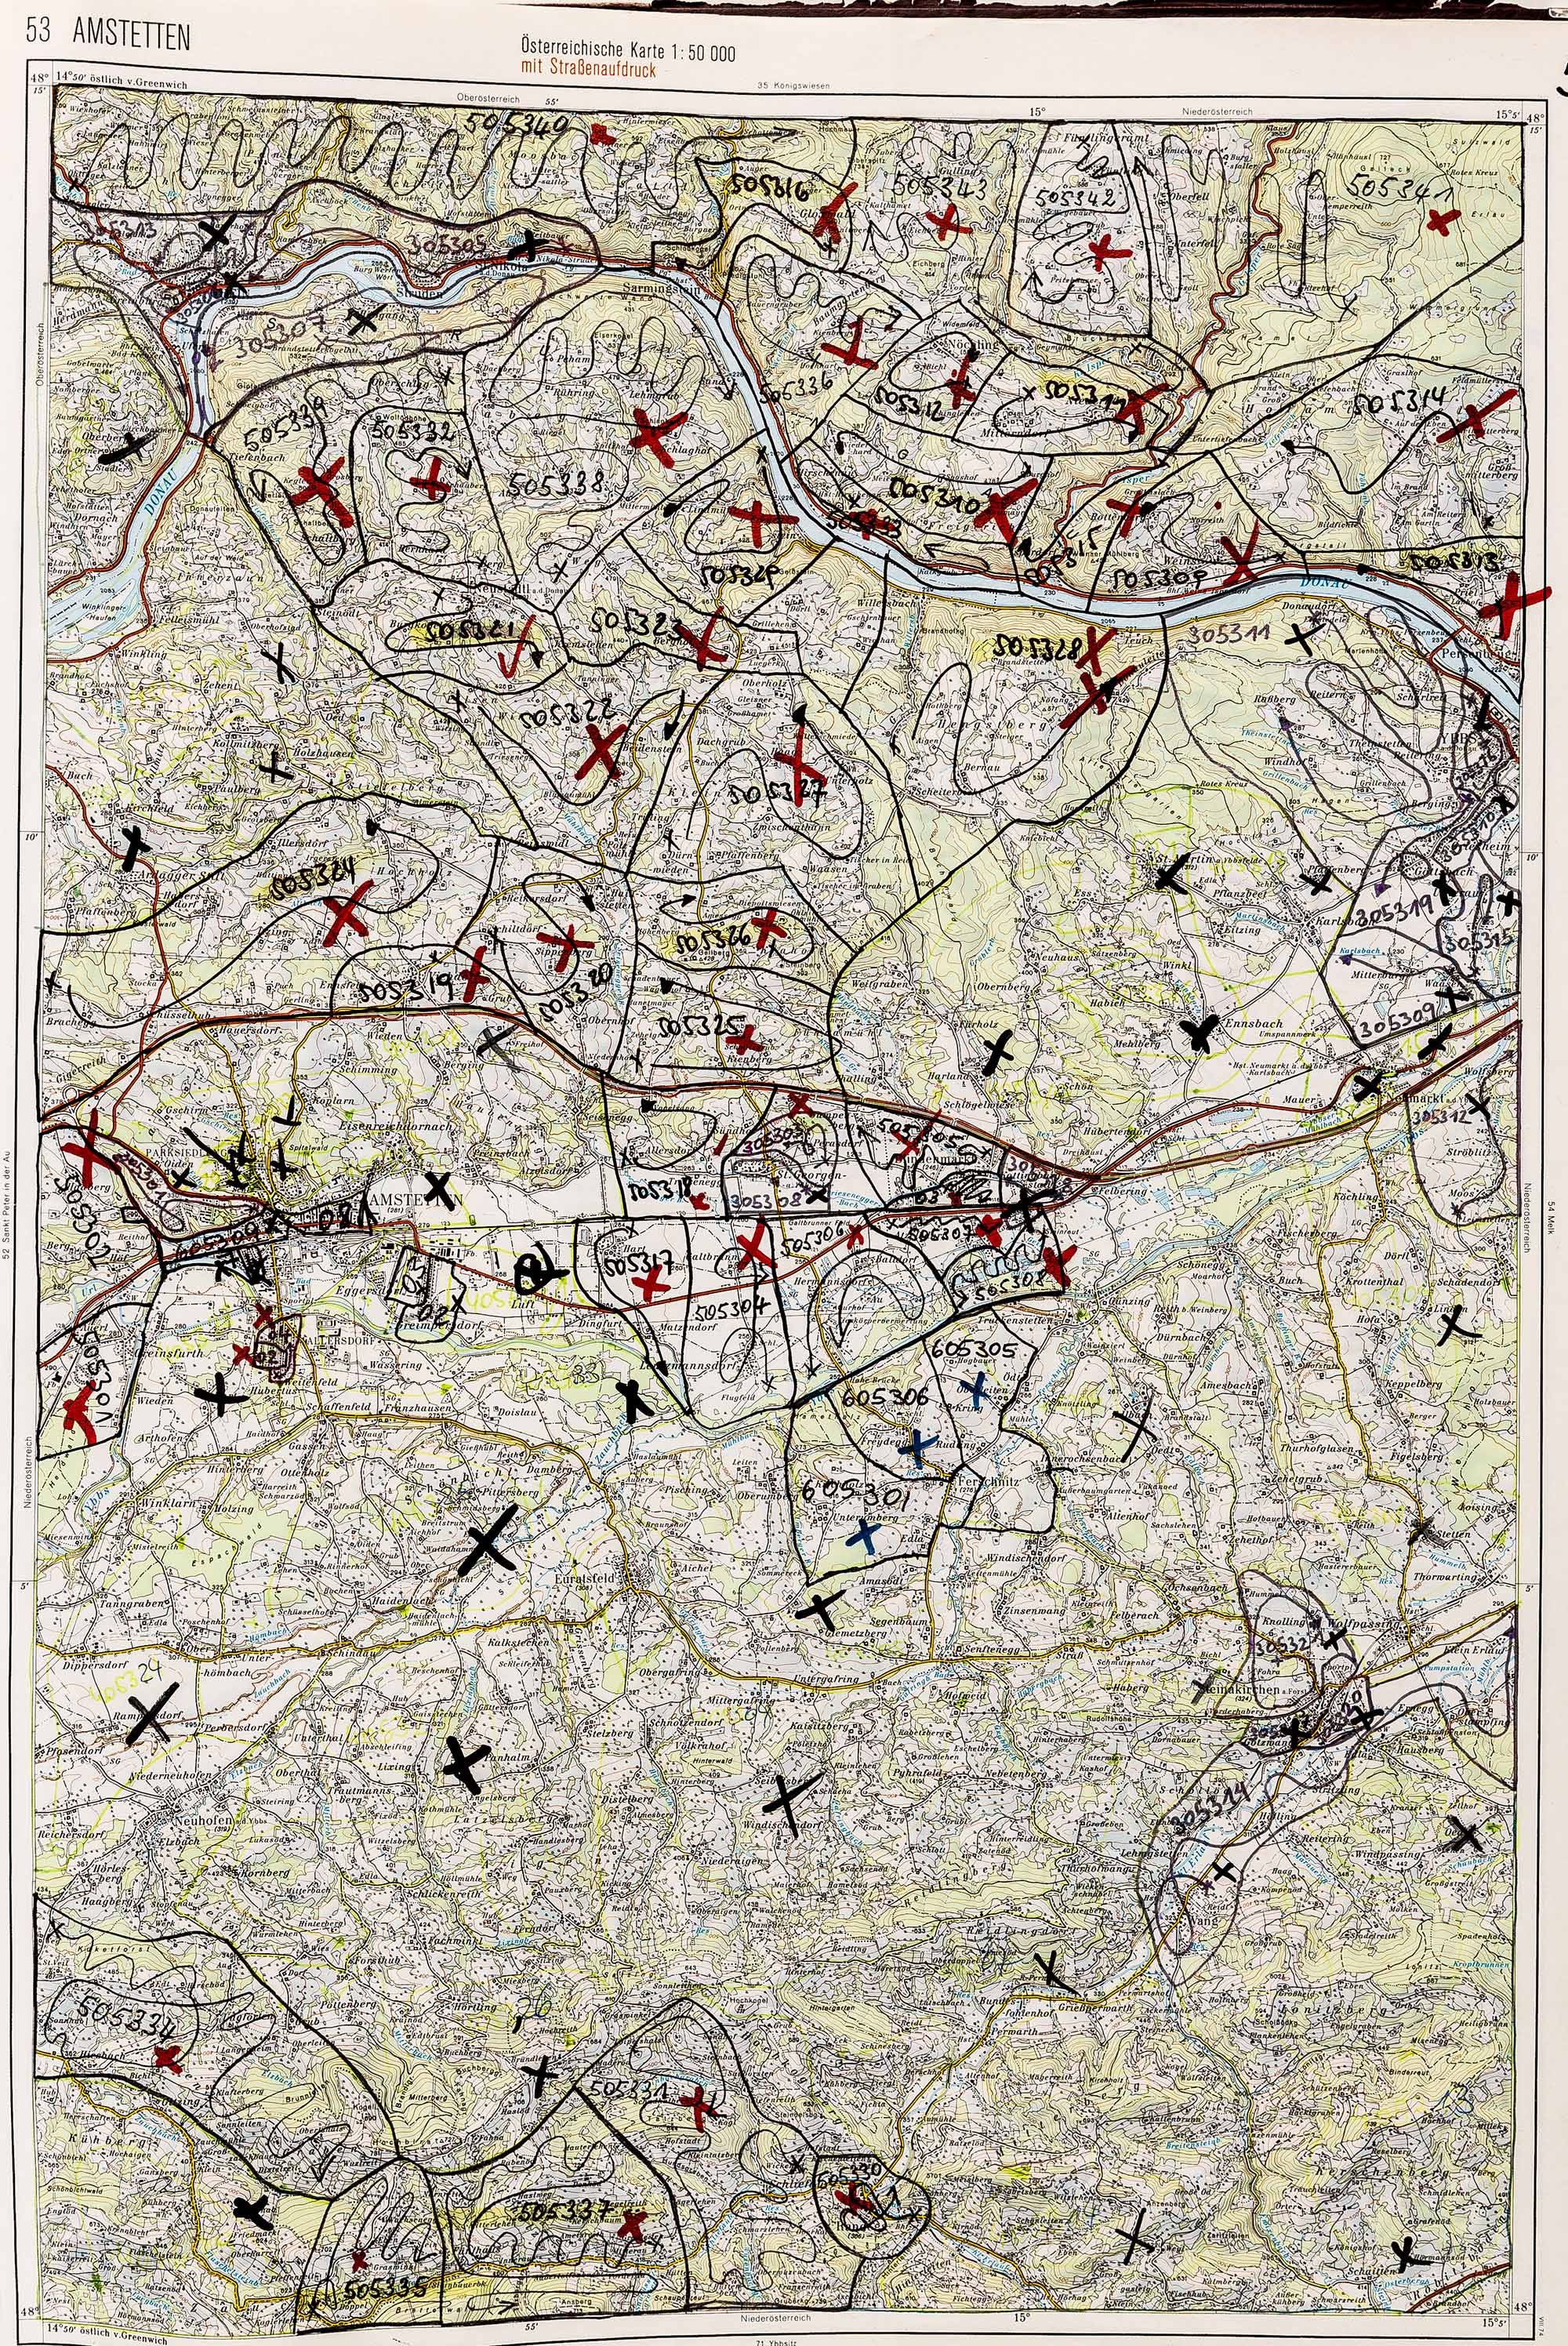 1983-1986 Karte 053